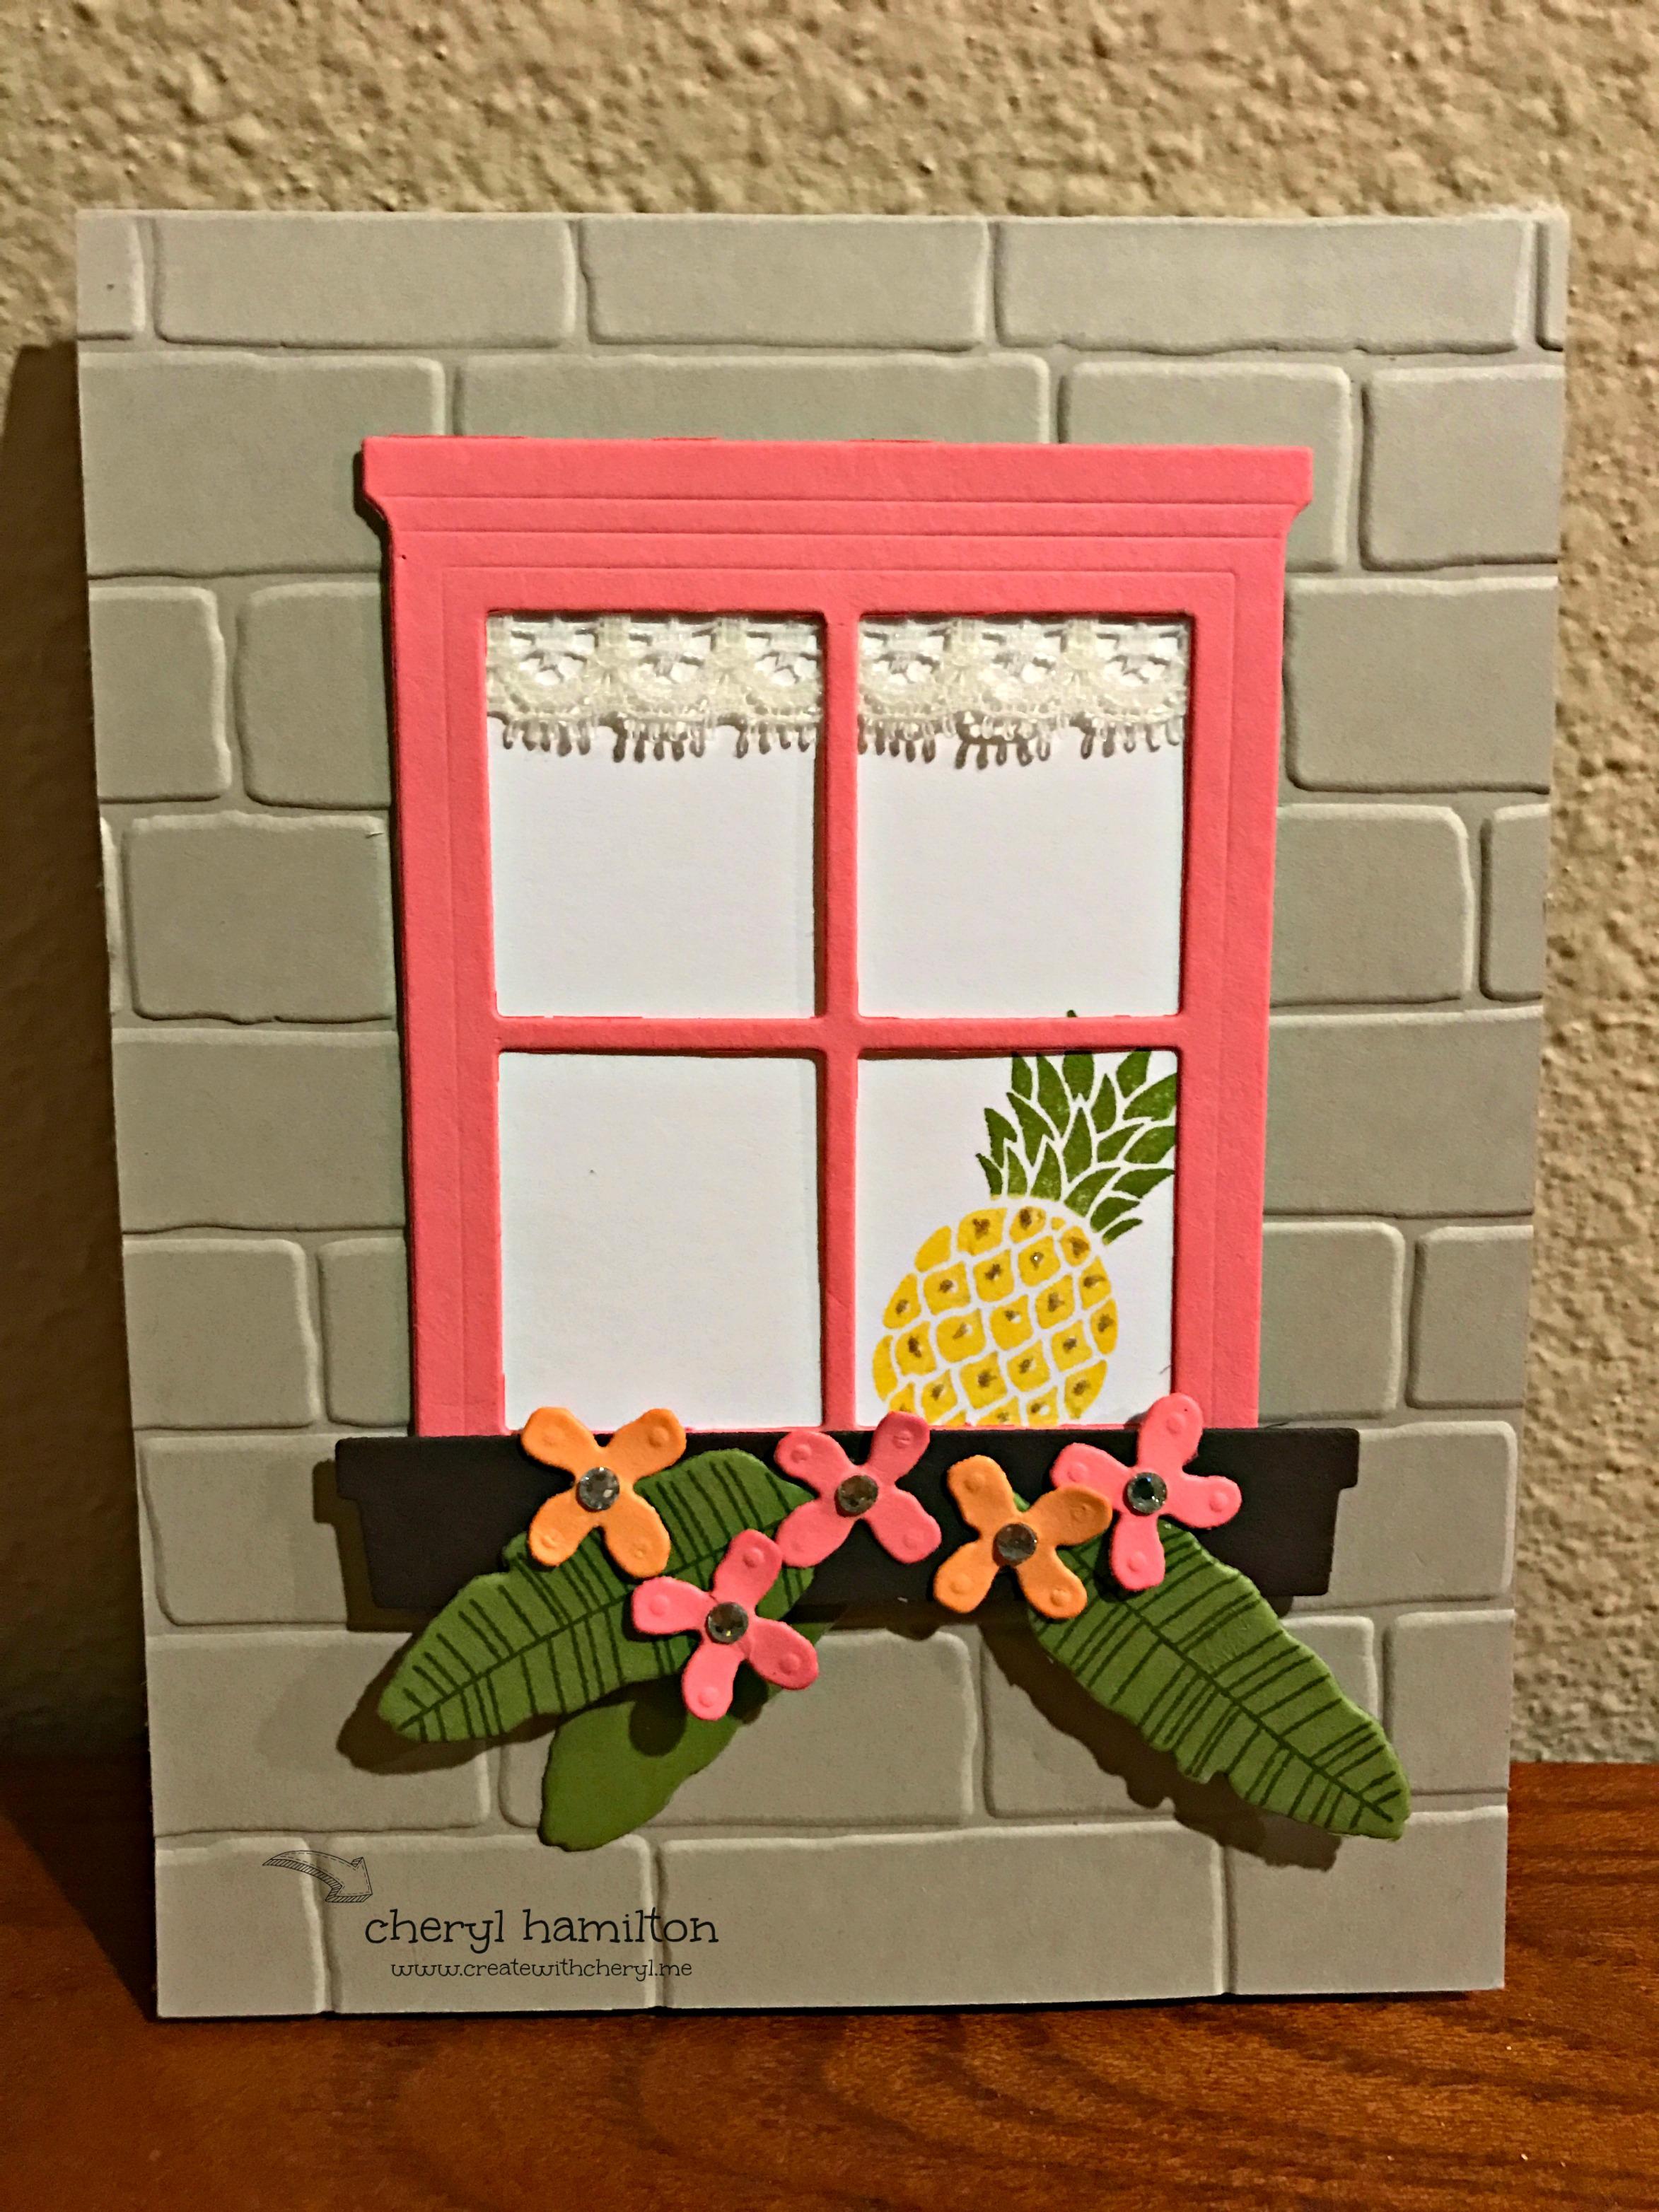 #SSINKCC40 Pineapple in the Window